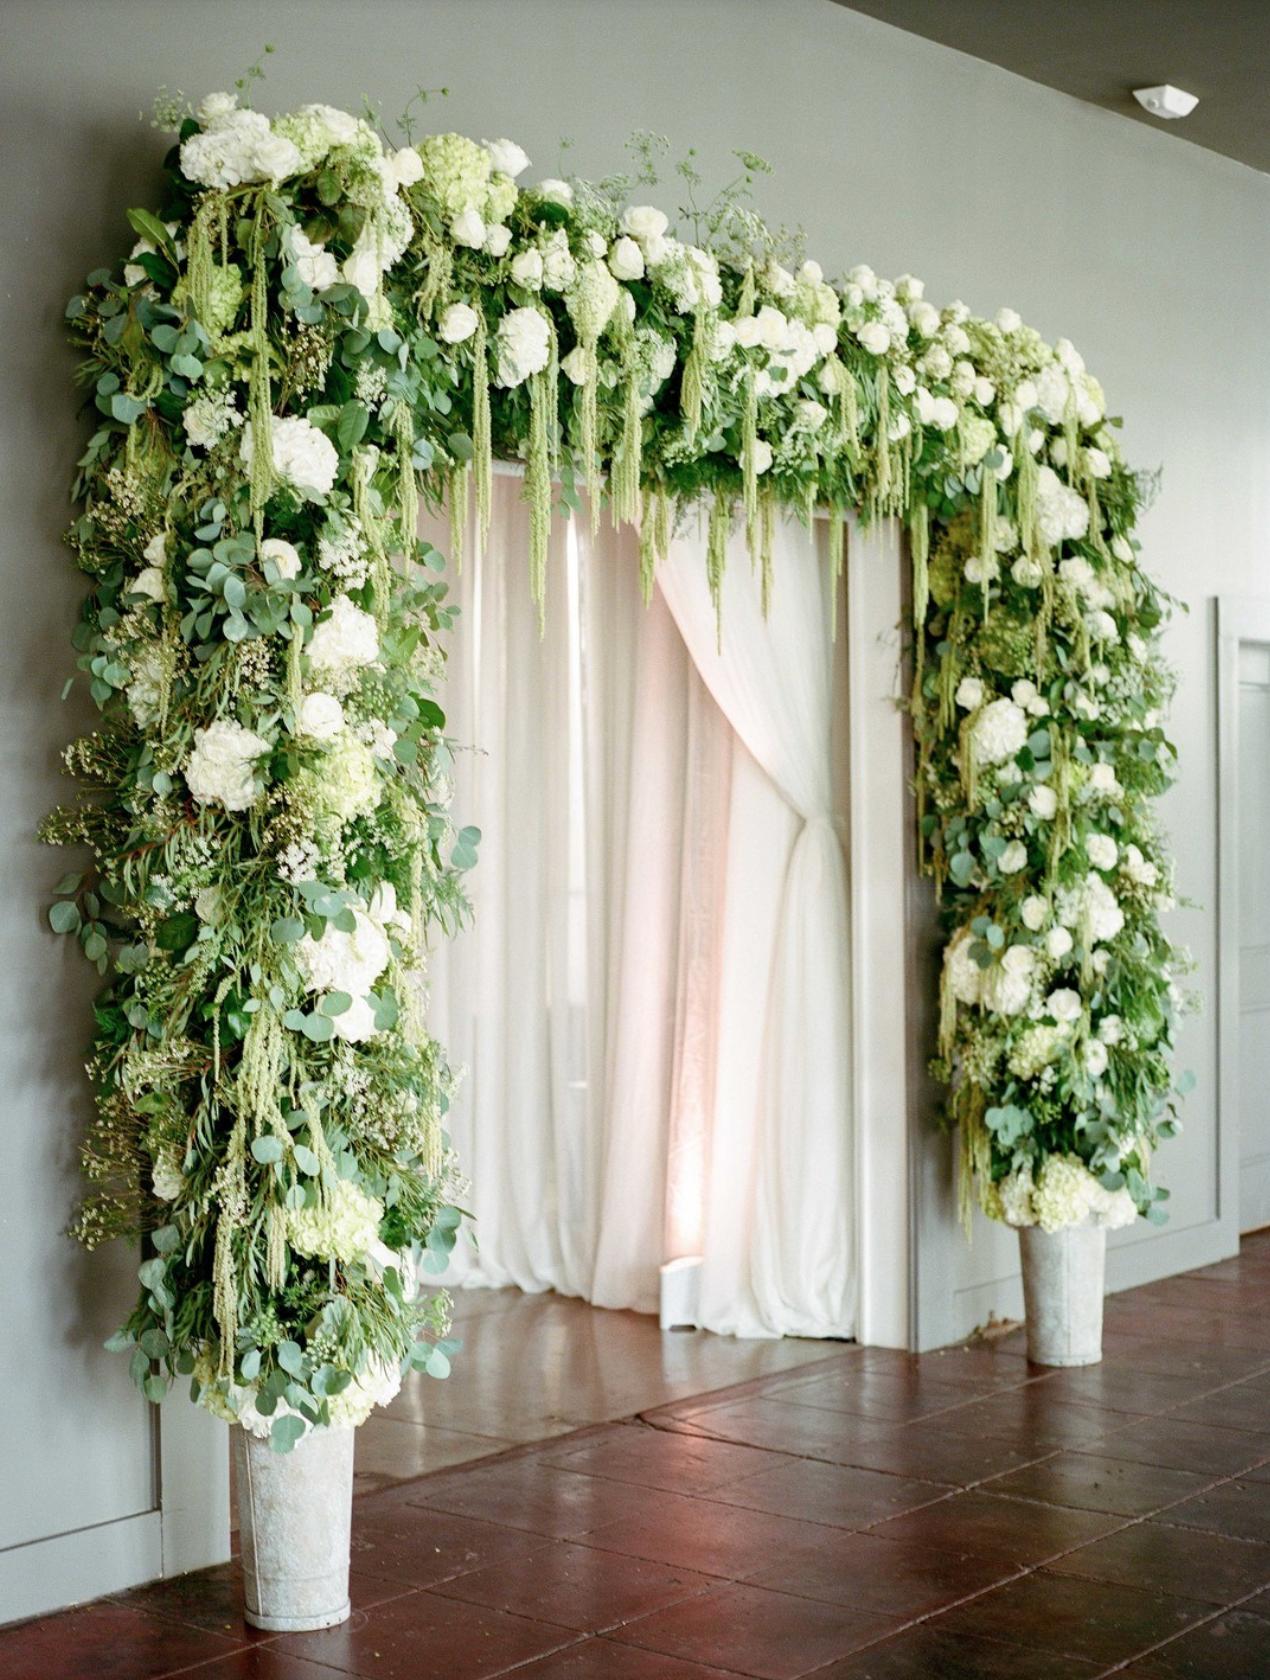 Kelli And Daniel Taylor Photography Event Planner Magnolia Vine Events Florals Thibodeaux S Floral Studio Rental Urban Wedding Floral Archway Wedding Arch